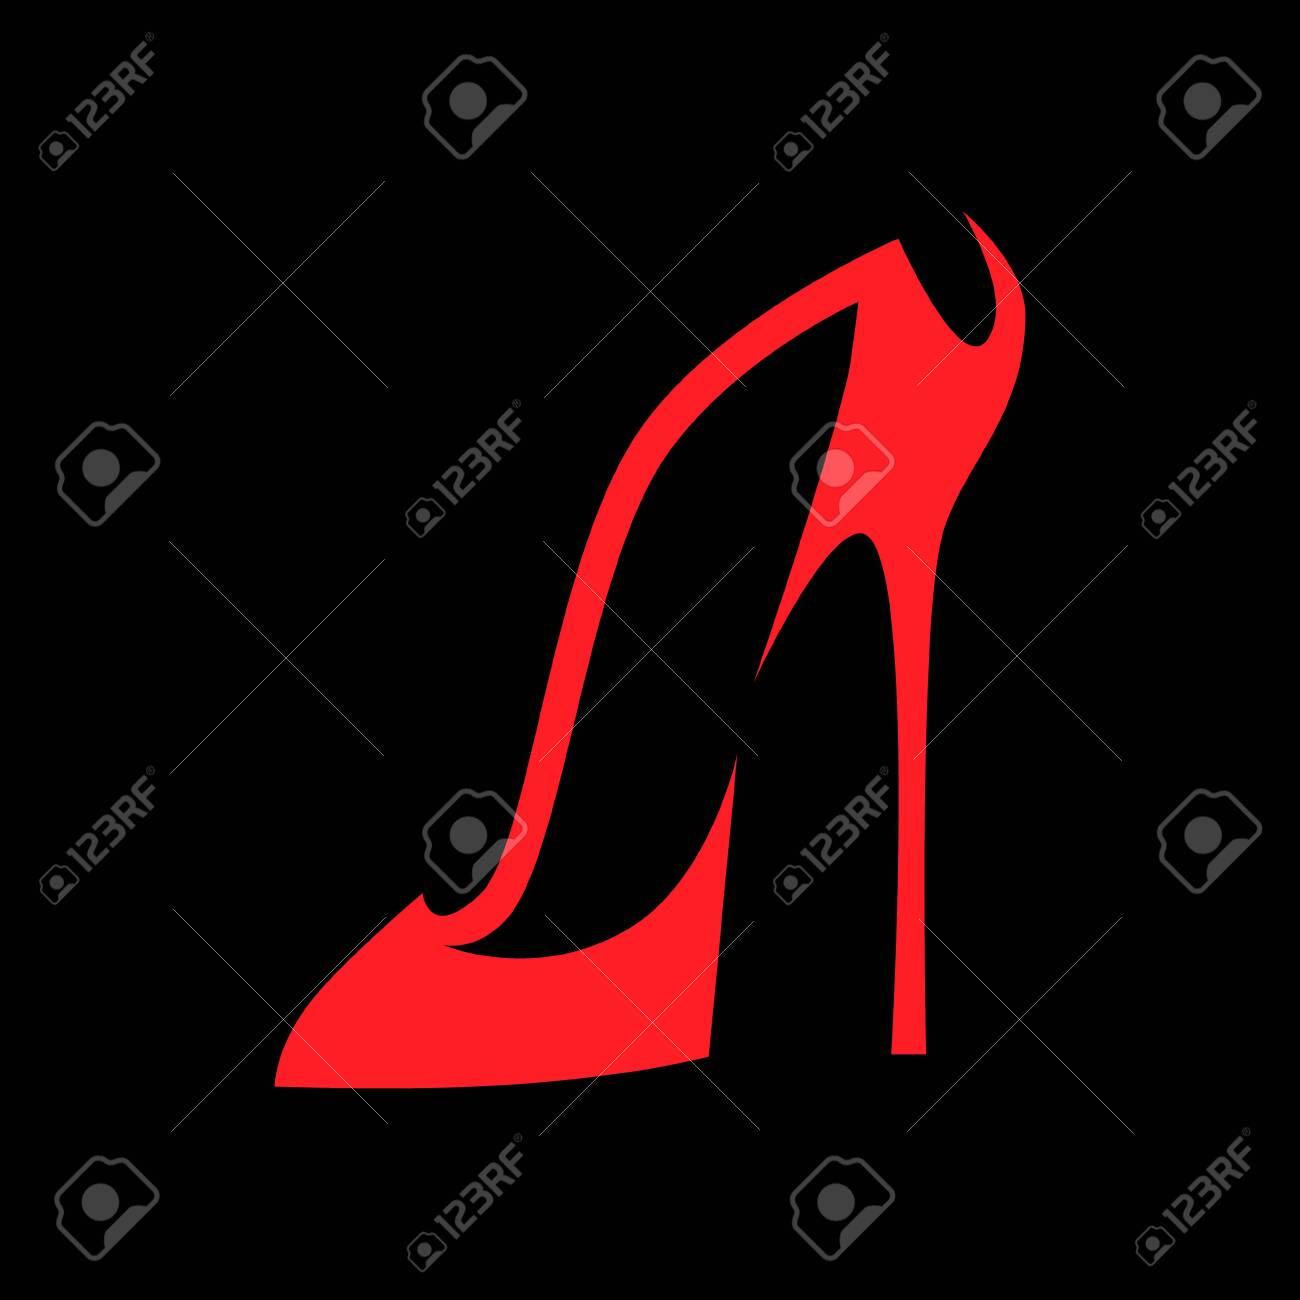 High heel shoe symbol on black backdrop - 138431093